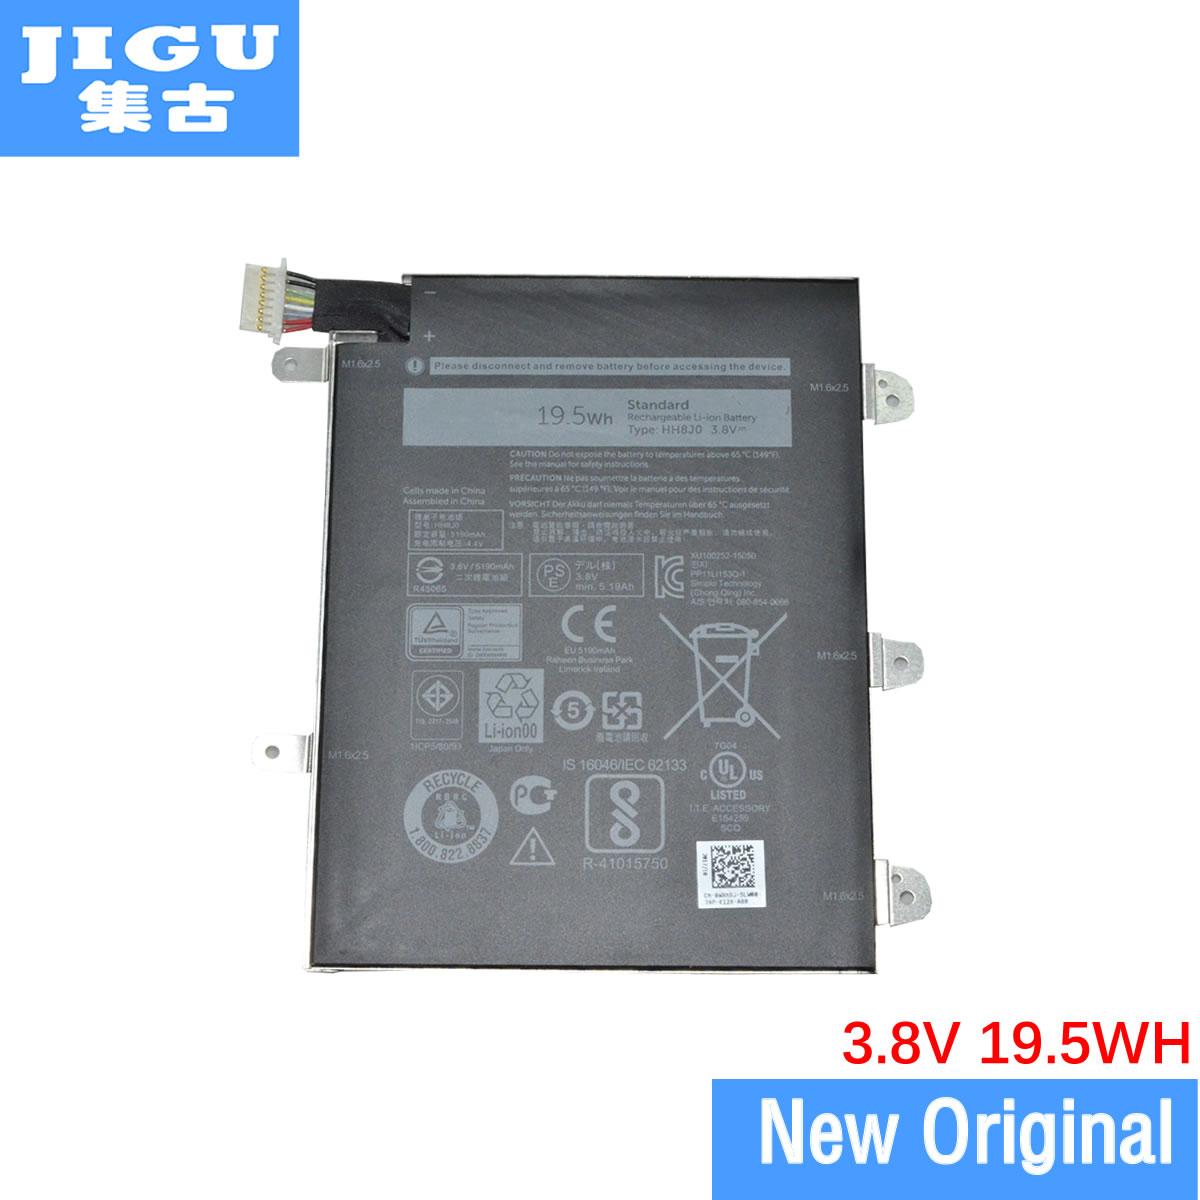 JIGU بطارية الكمبيوتر المحمول الأصلي HH8J0 HH8JO WXR8J لديل